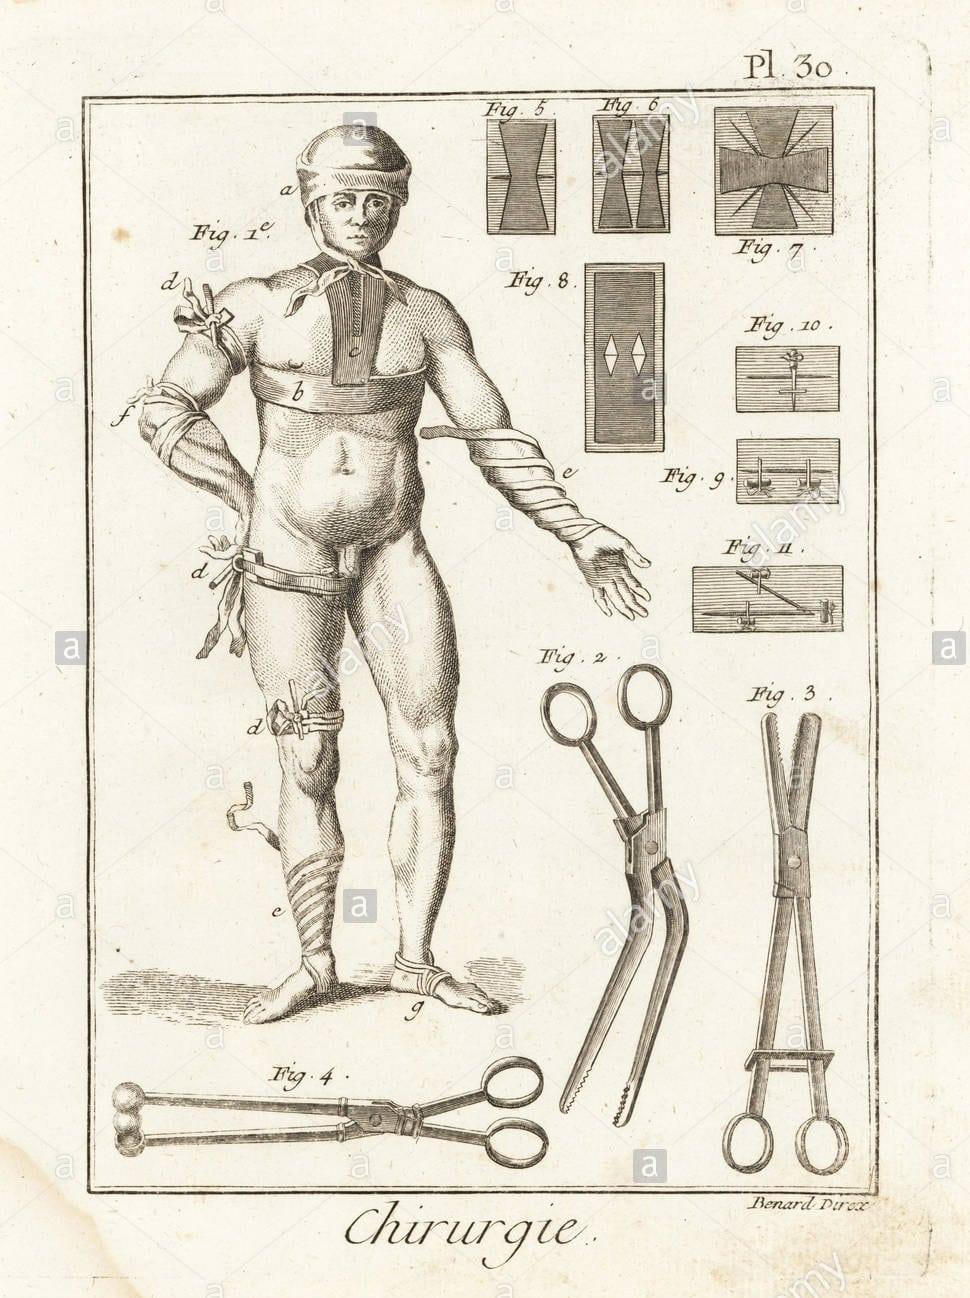 18 th century bandage sketch